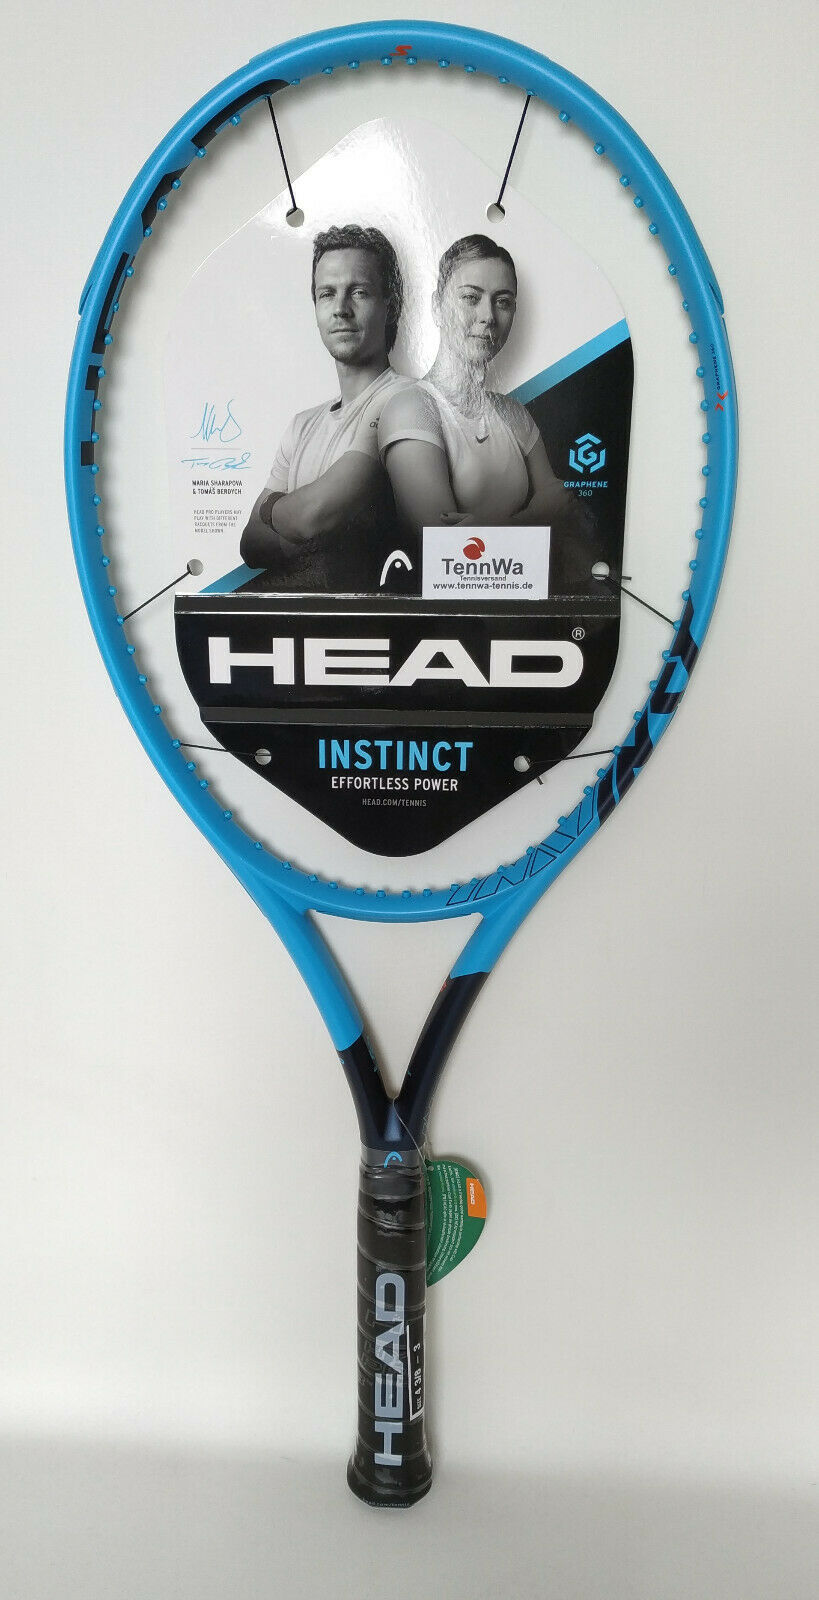 Raquette de tennis Head Graphene 360 Instinct S (285 g) avec corde-BERDYCH